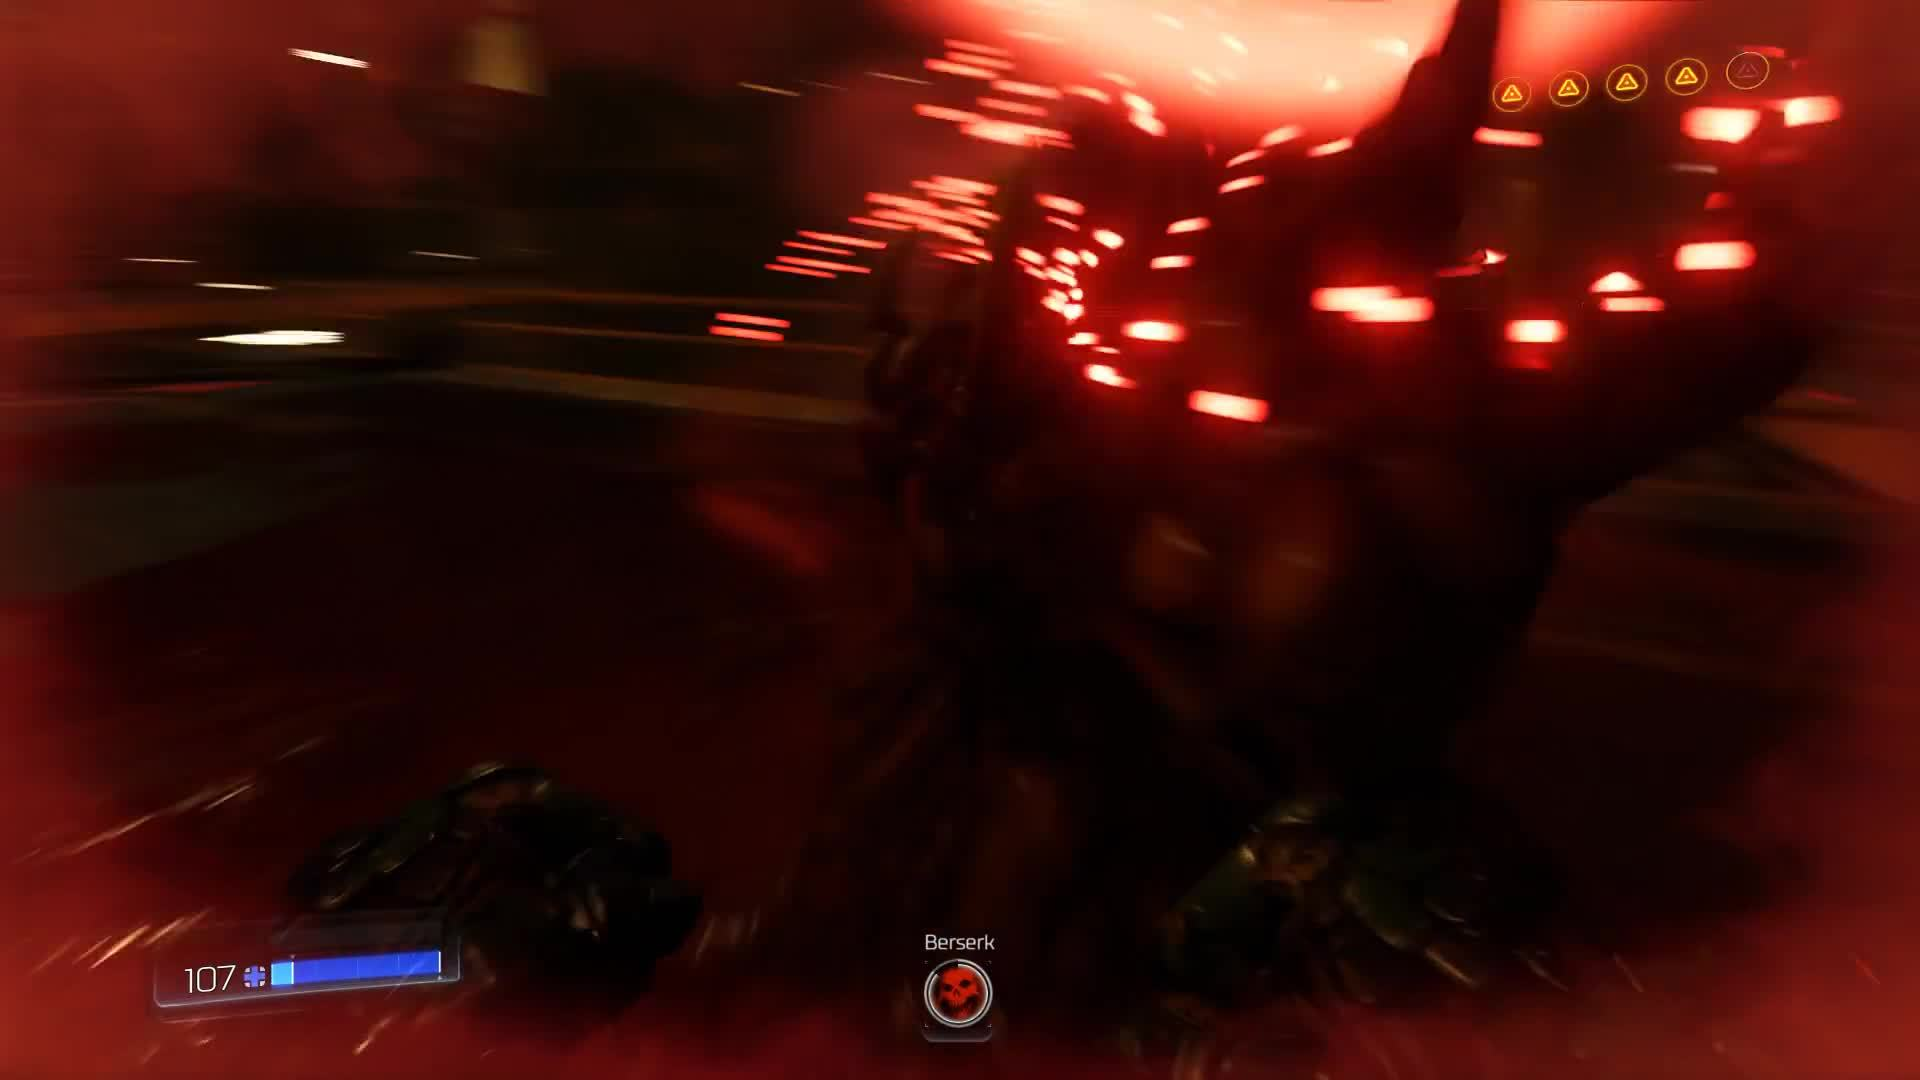 DoomNest4 Berserk GIFs